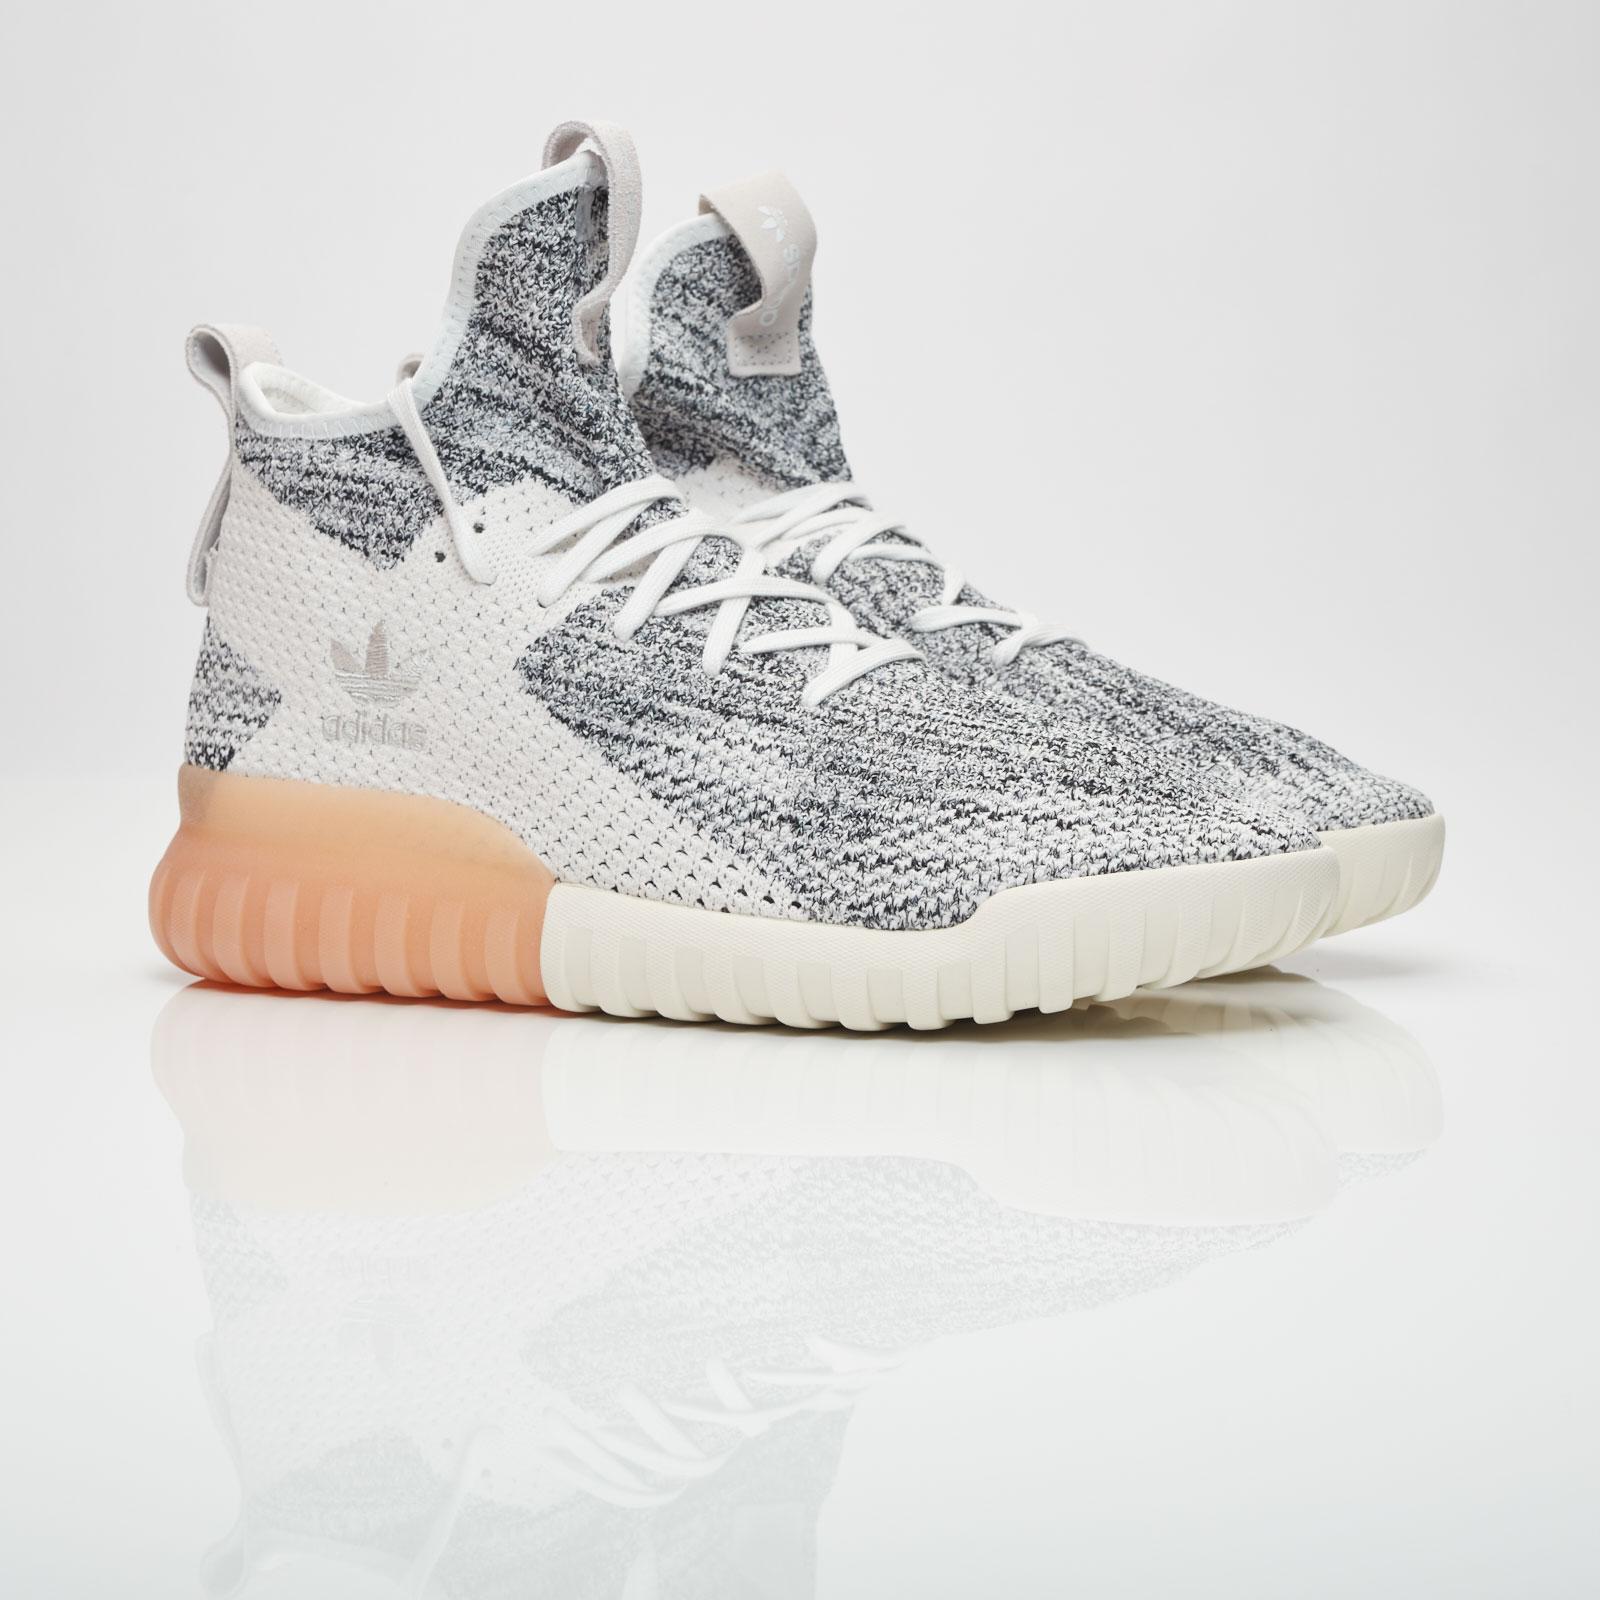 pretty nice 0b8b8 aa3c2 adidas Tubular X PK - By3146 - Sneakersnstuff | sneakers ...